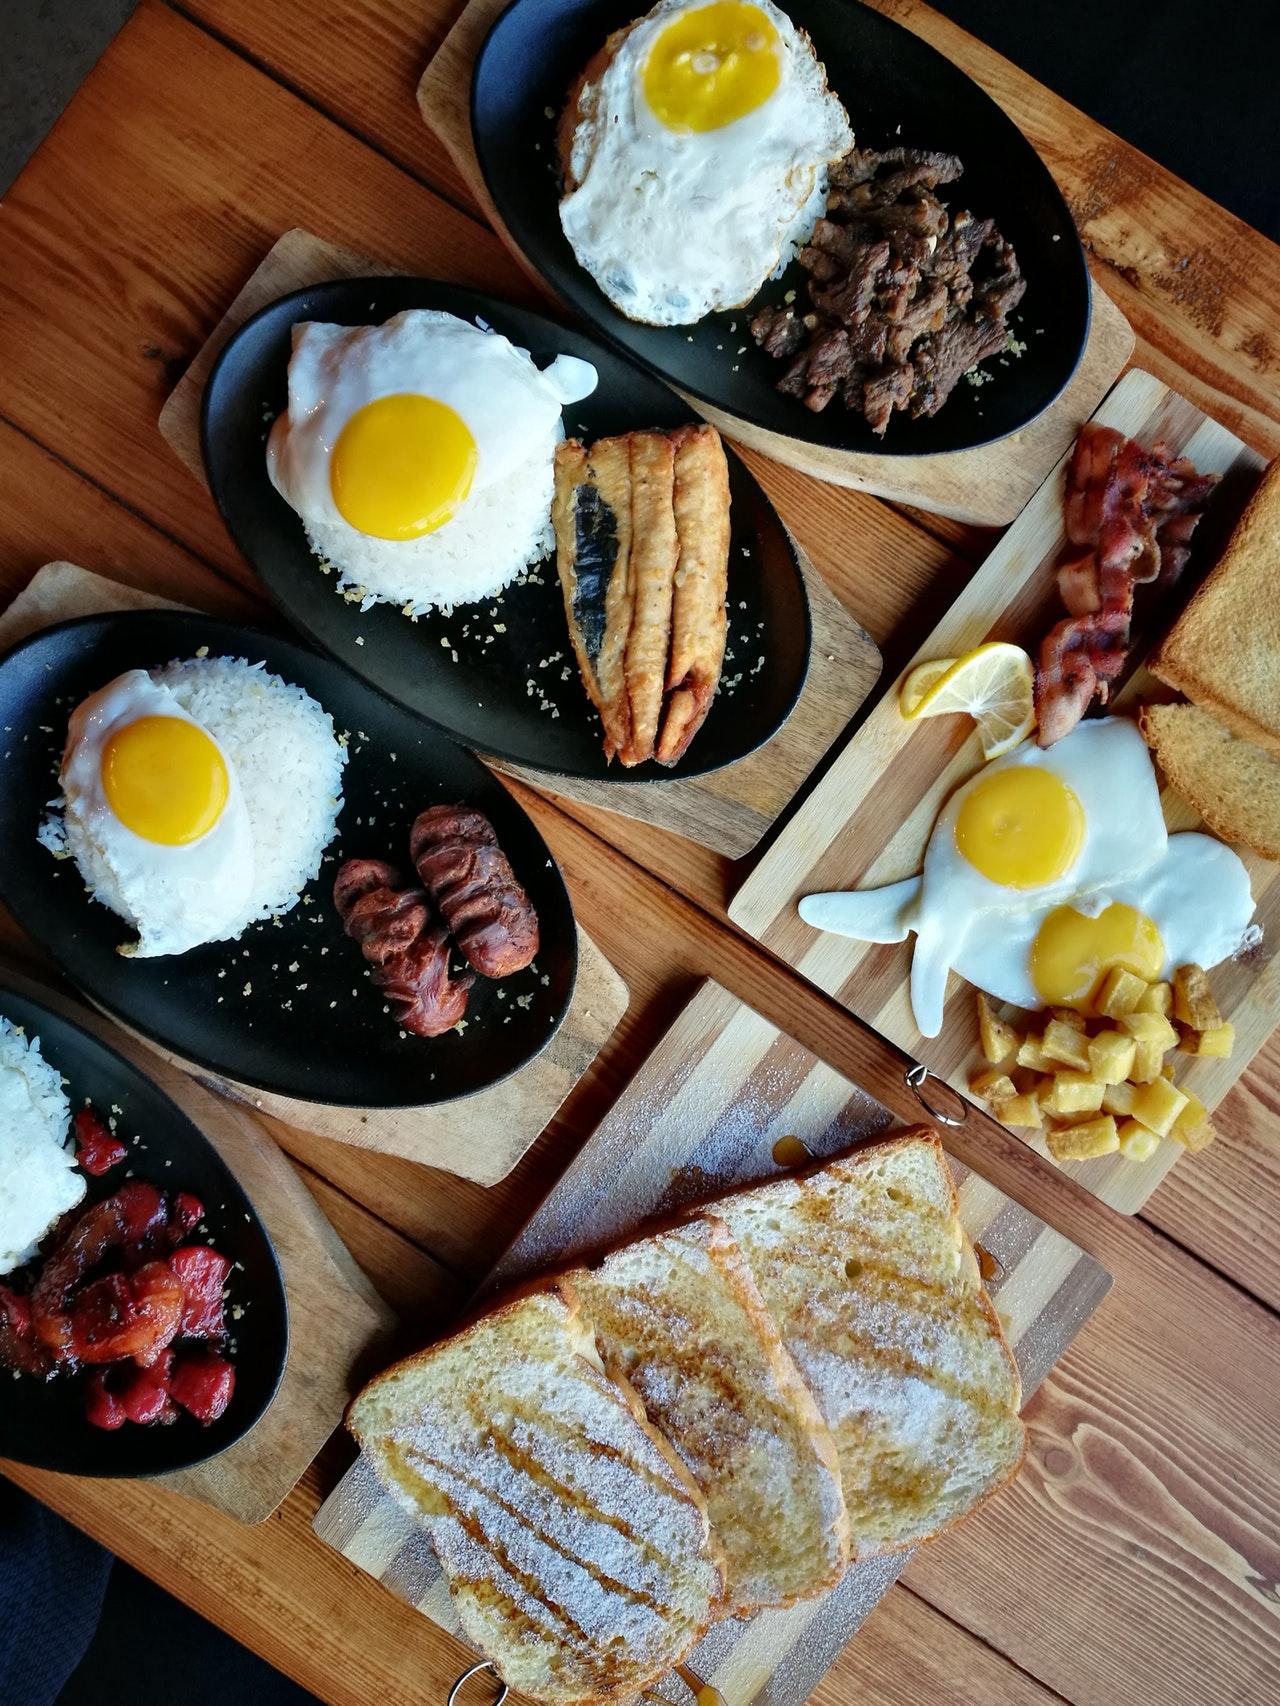 Resep Aneka Olahan Telur Yang Sederhana